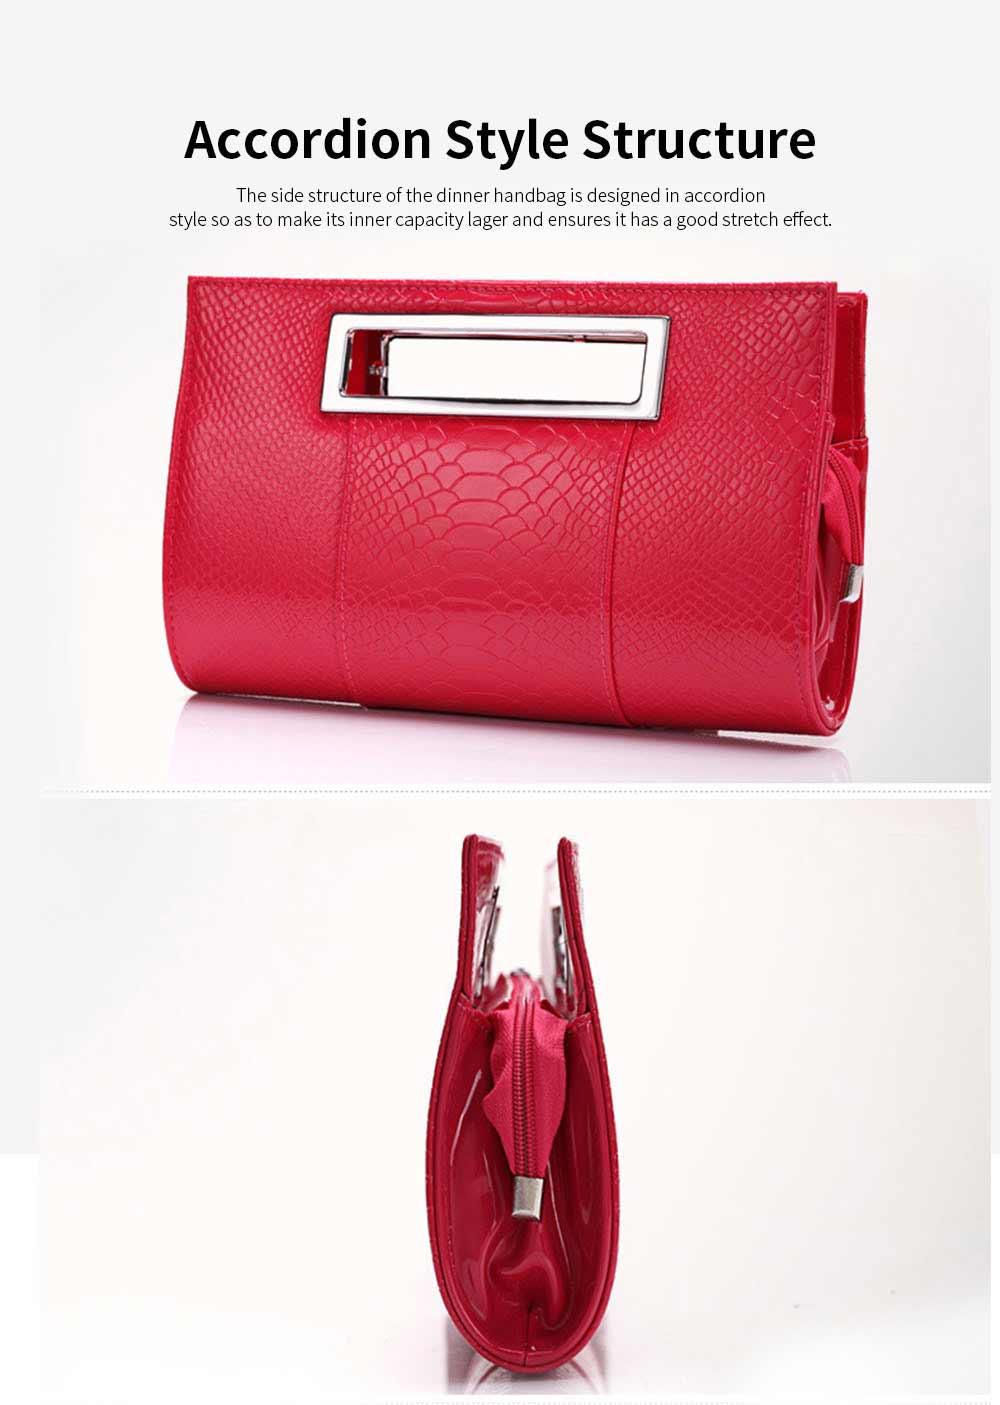 Women Evening Bag Casual PU Leather Dinner Bag with Removable Handle Zipper Pocket Durable Wear Resistant Concealed Pocket Crocodile Pattern Handbag 2